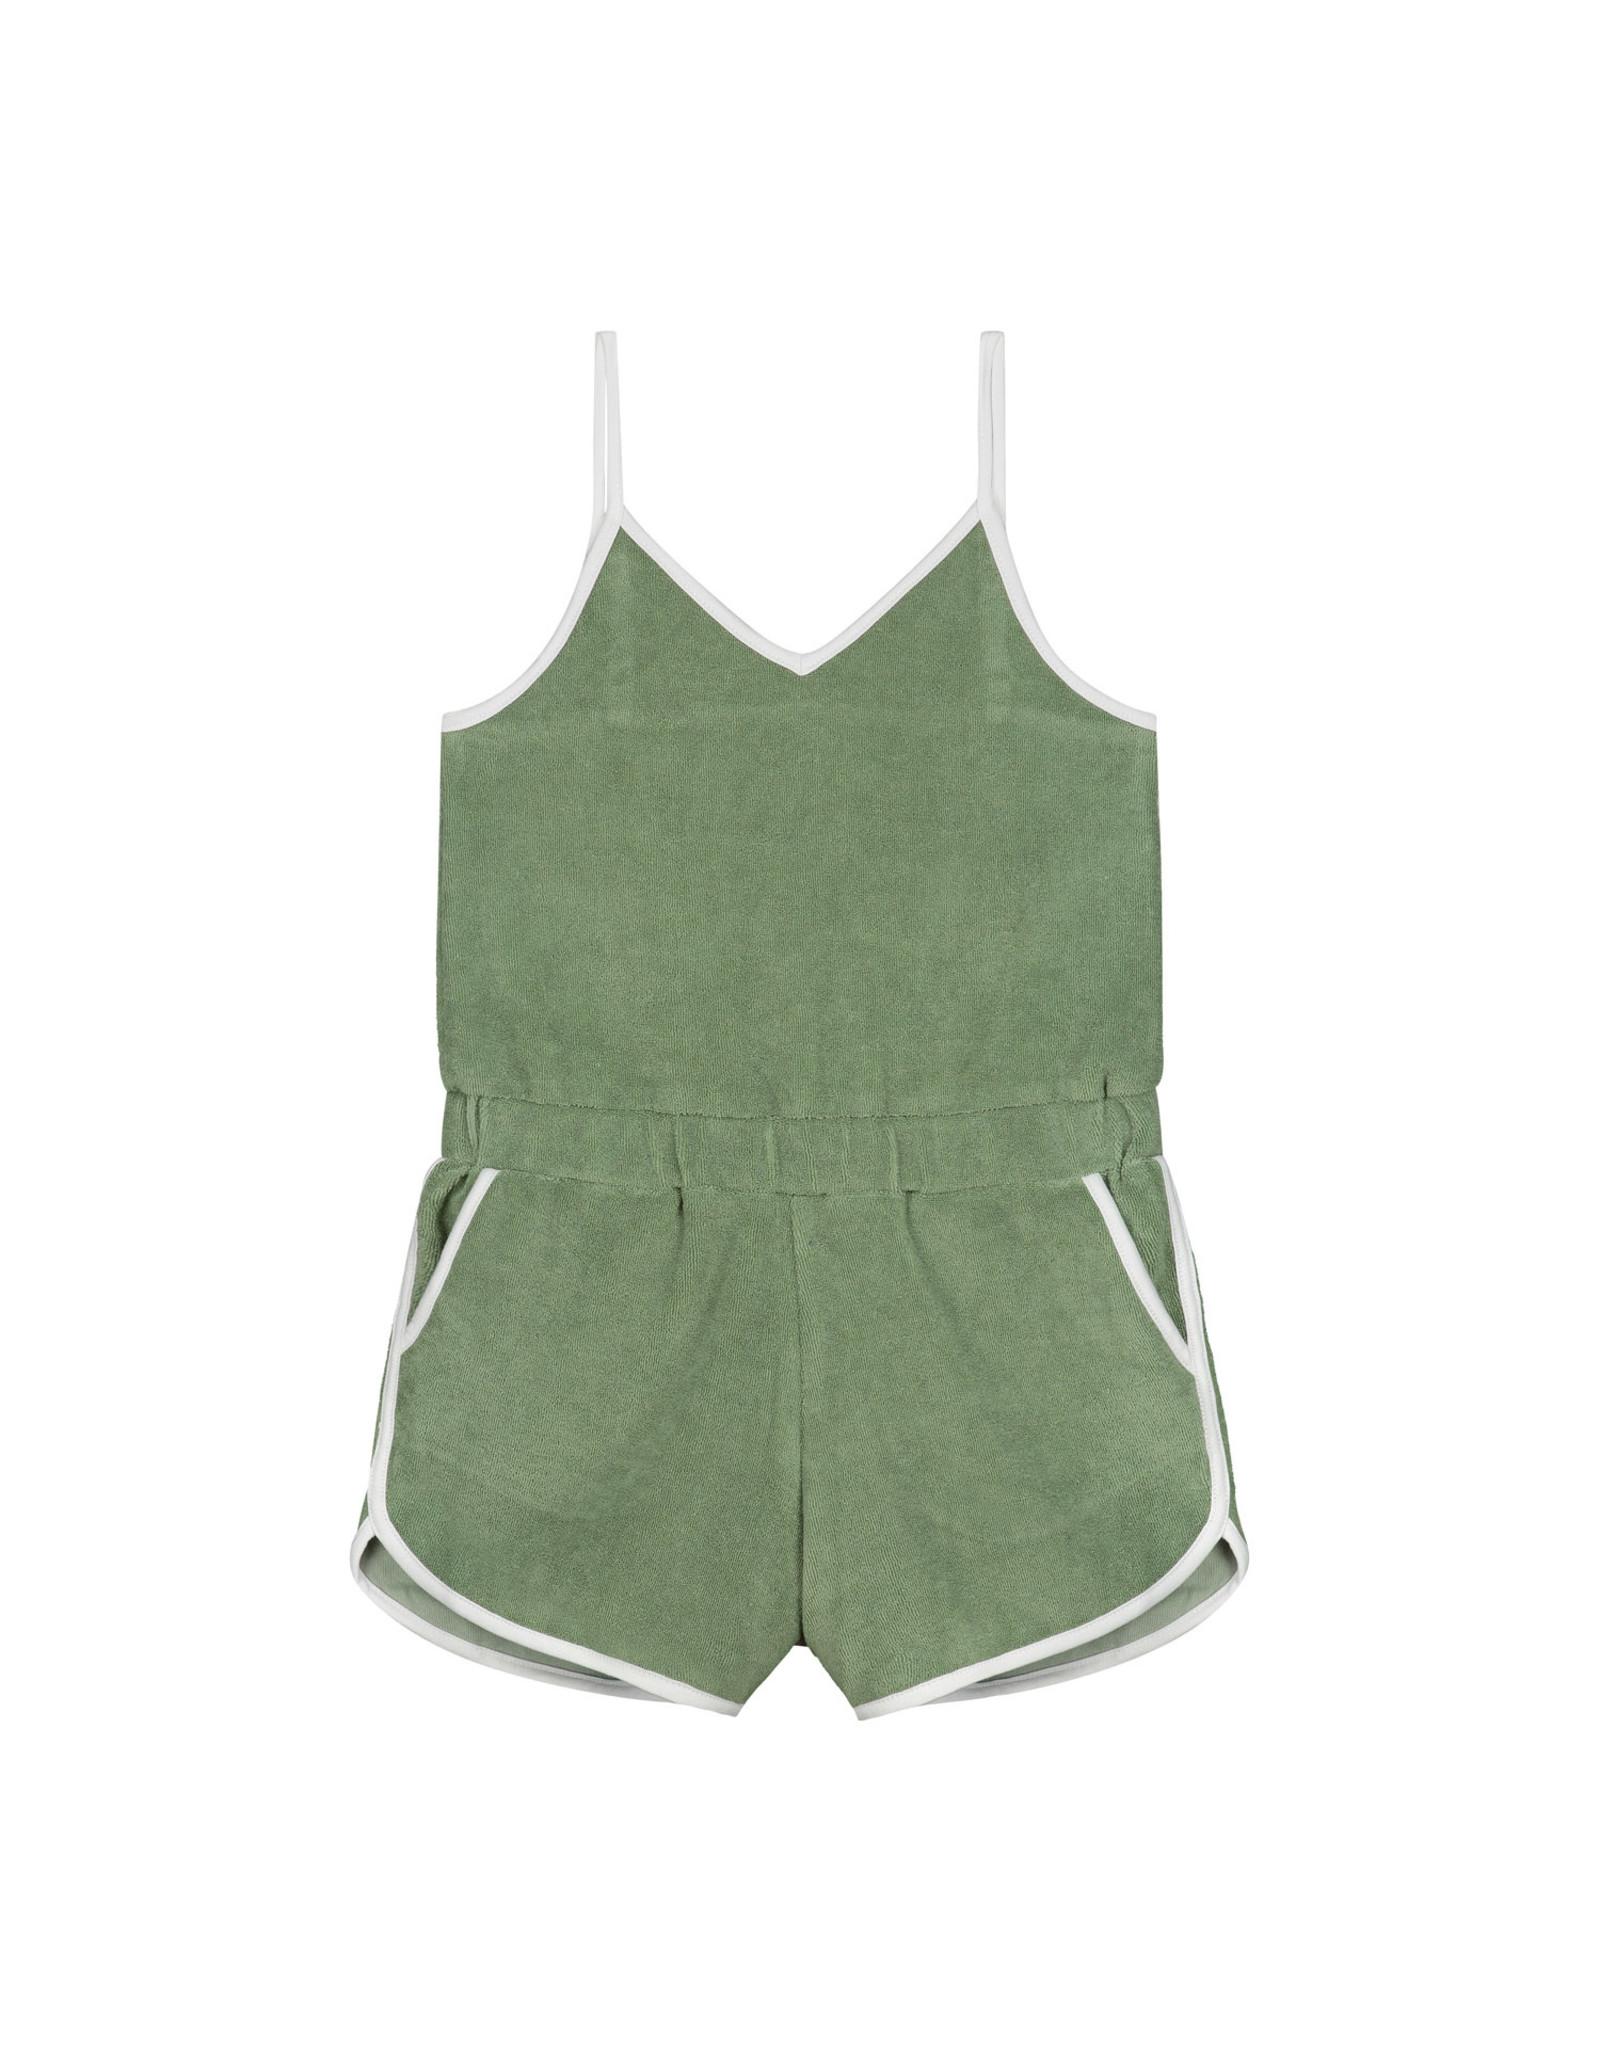 Shiwi girls braga jumpsuit dusty pistache green